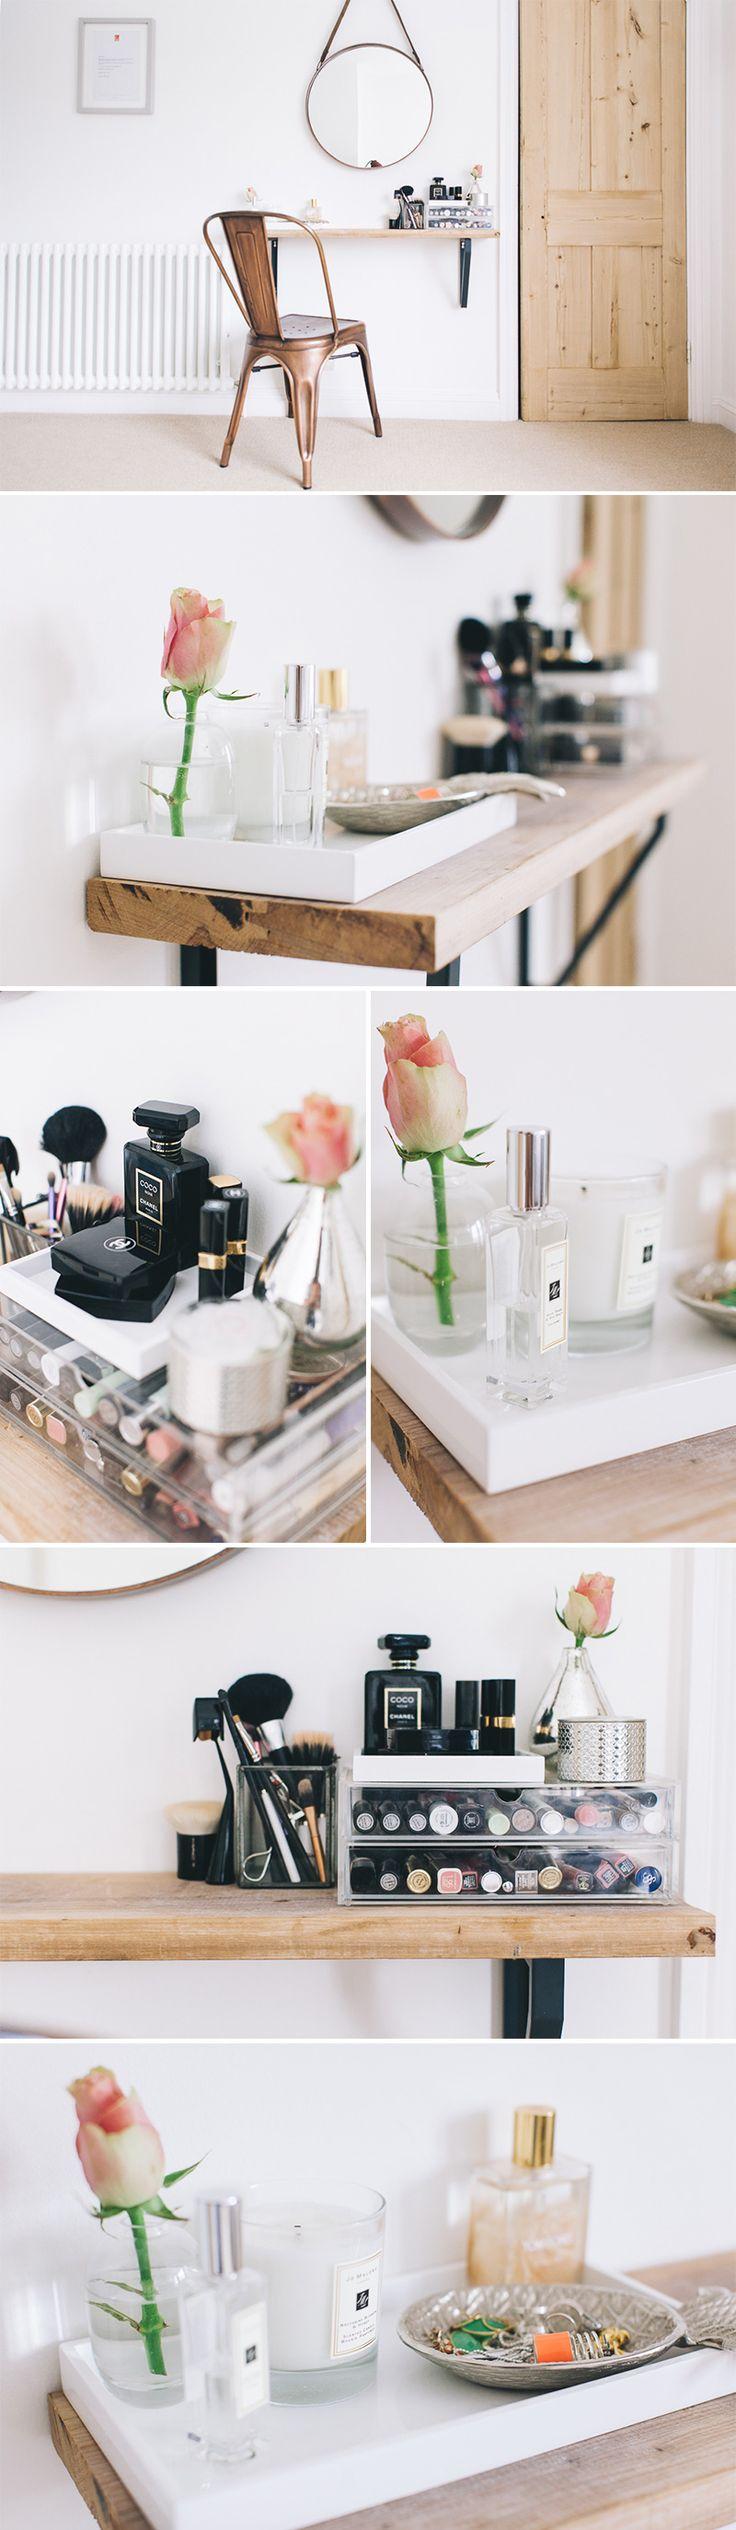 best apartment ideas images on pinterest home ideas bedroom